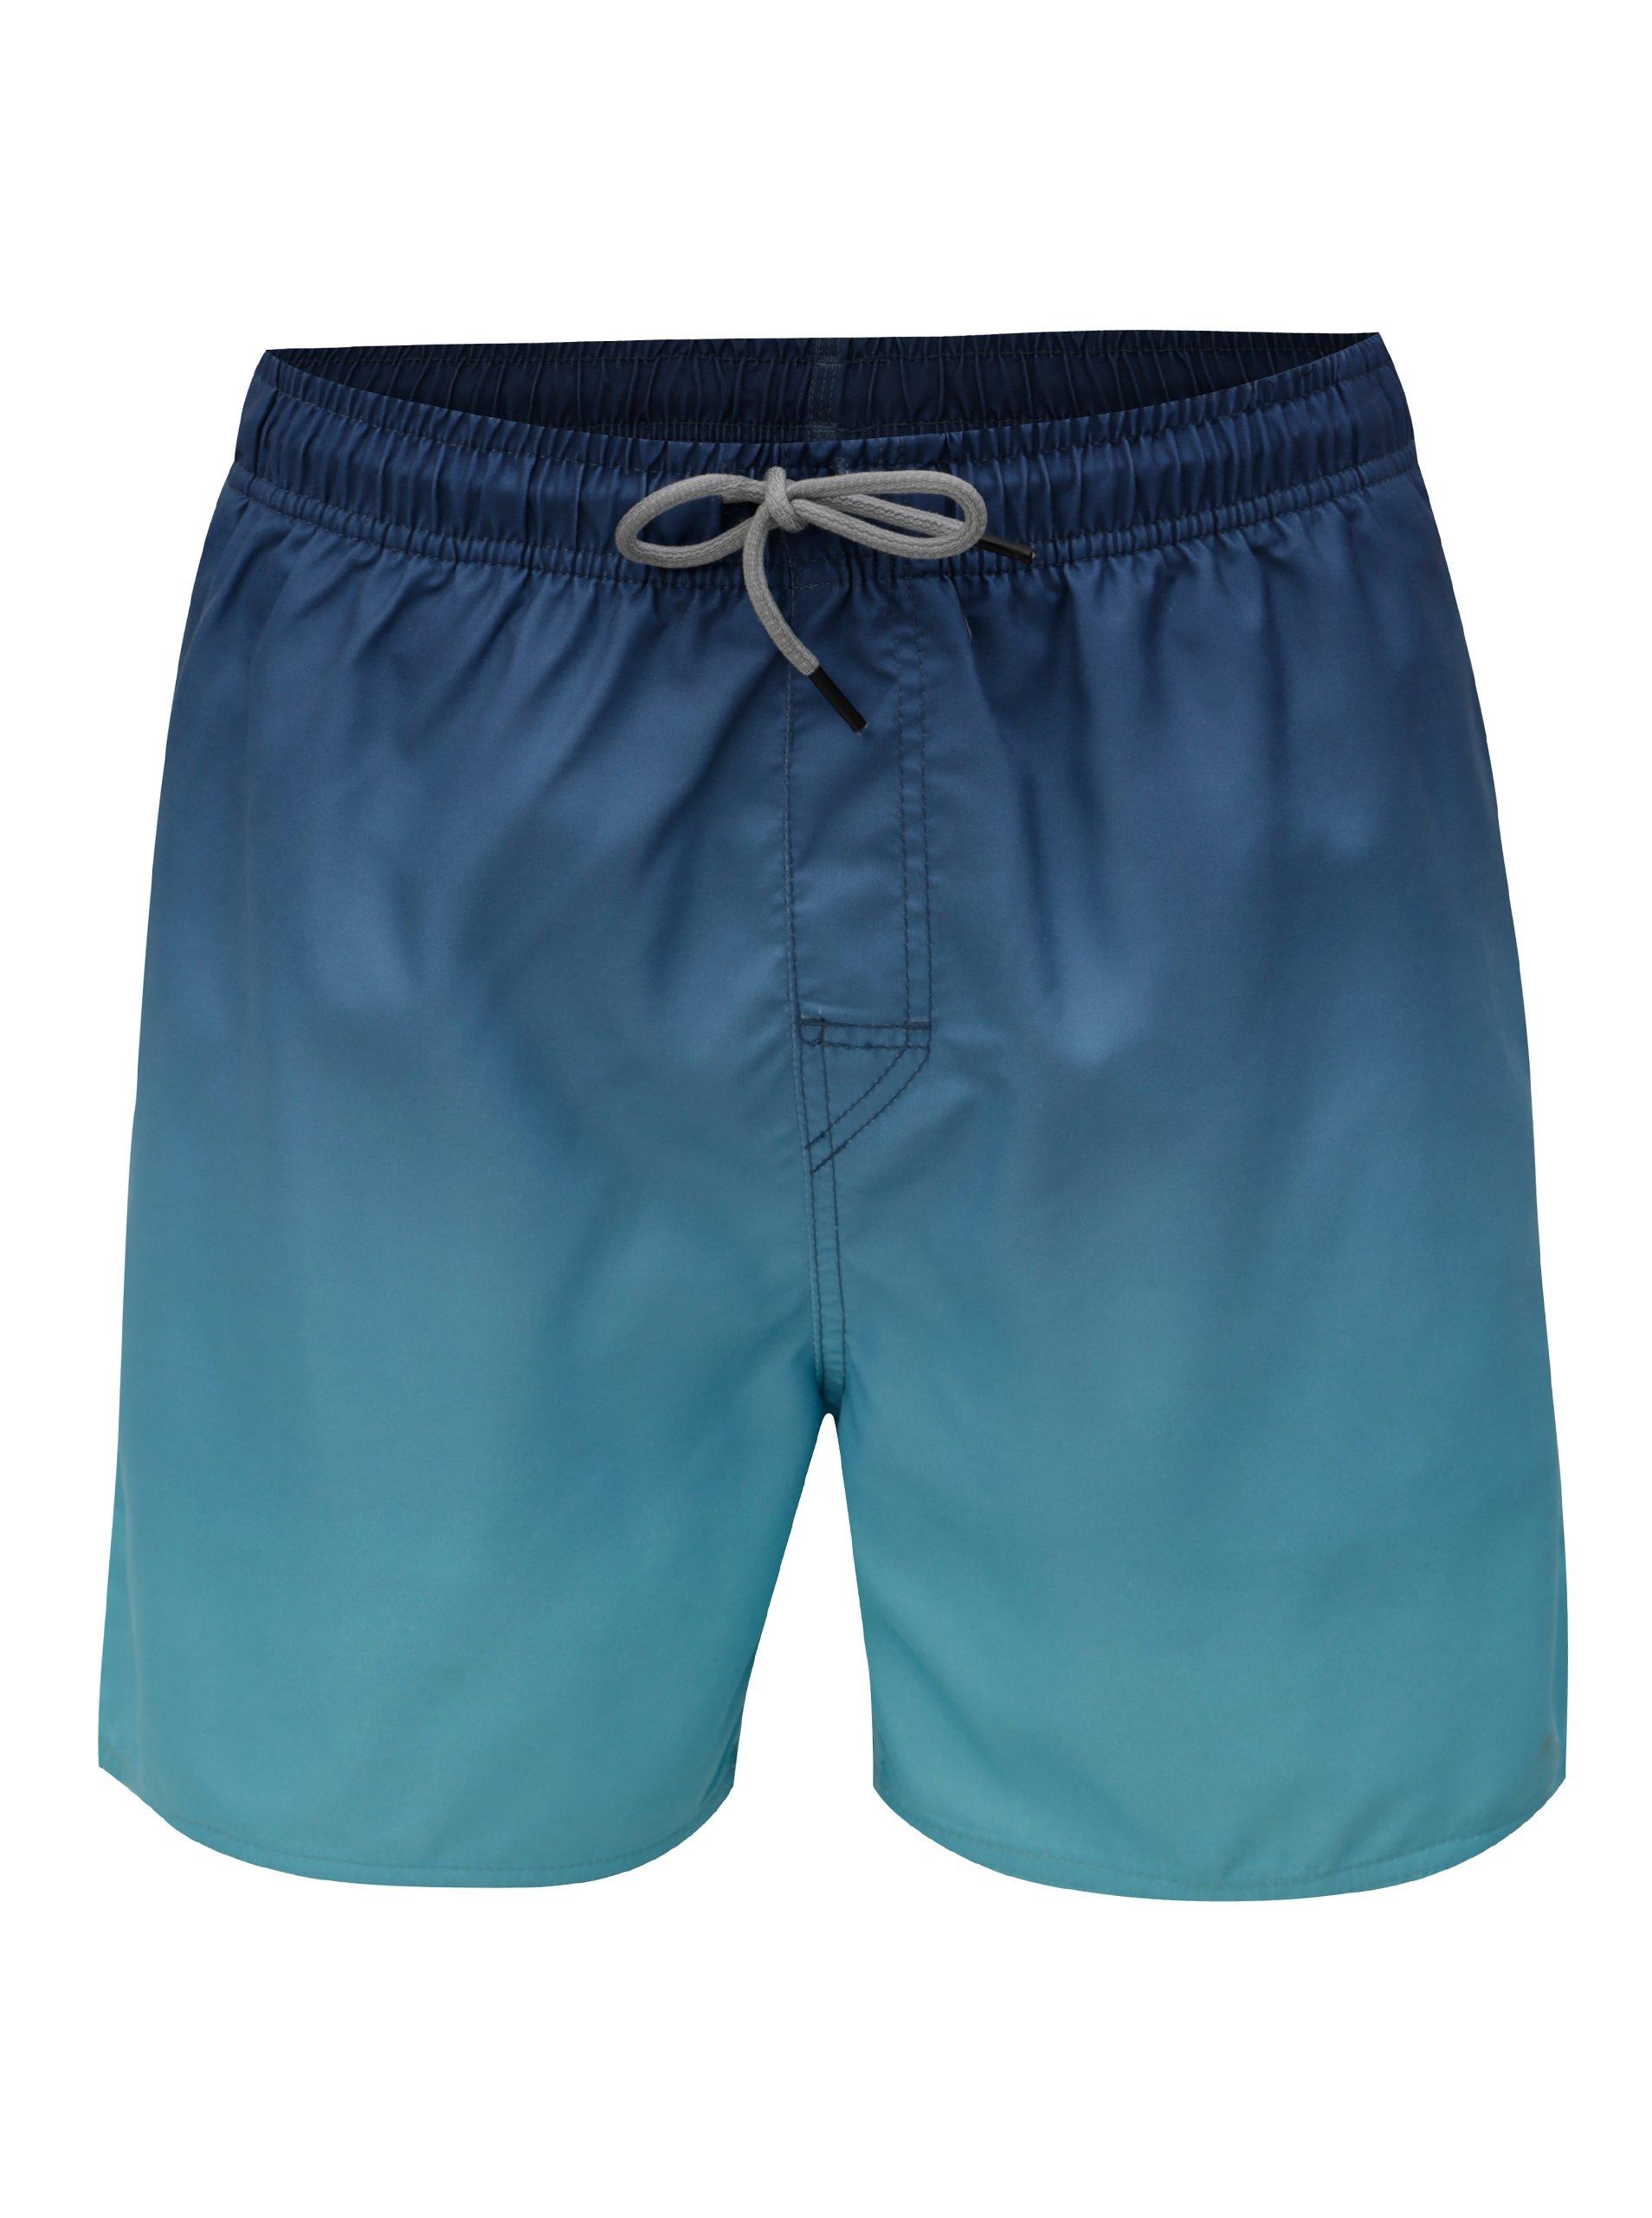 Zeleno-modré pásnke plavky Rip Curl